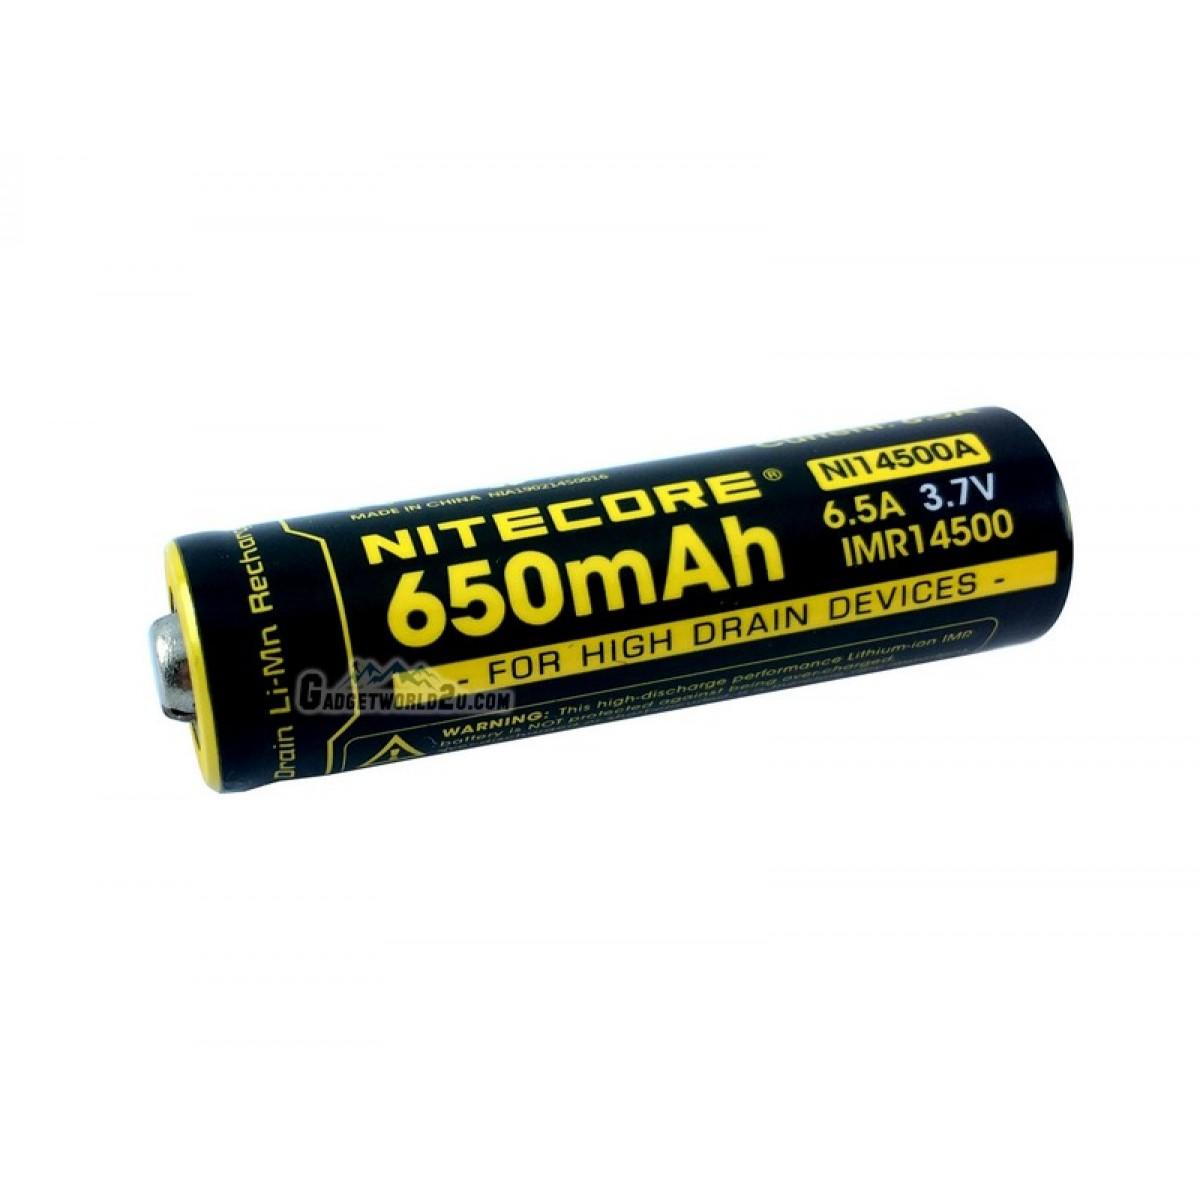 Nitecore IMR 14500 3.7V 650mAh Li-ion Rechargeable Battery (NL14500A)